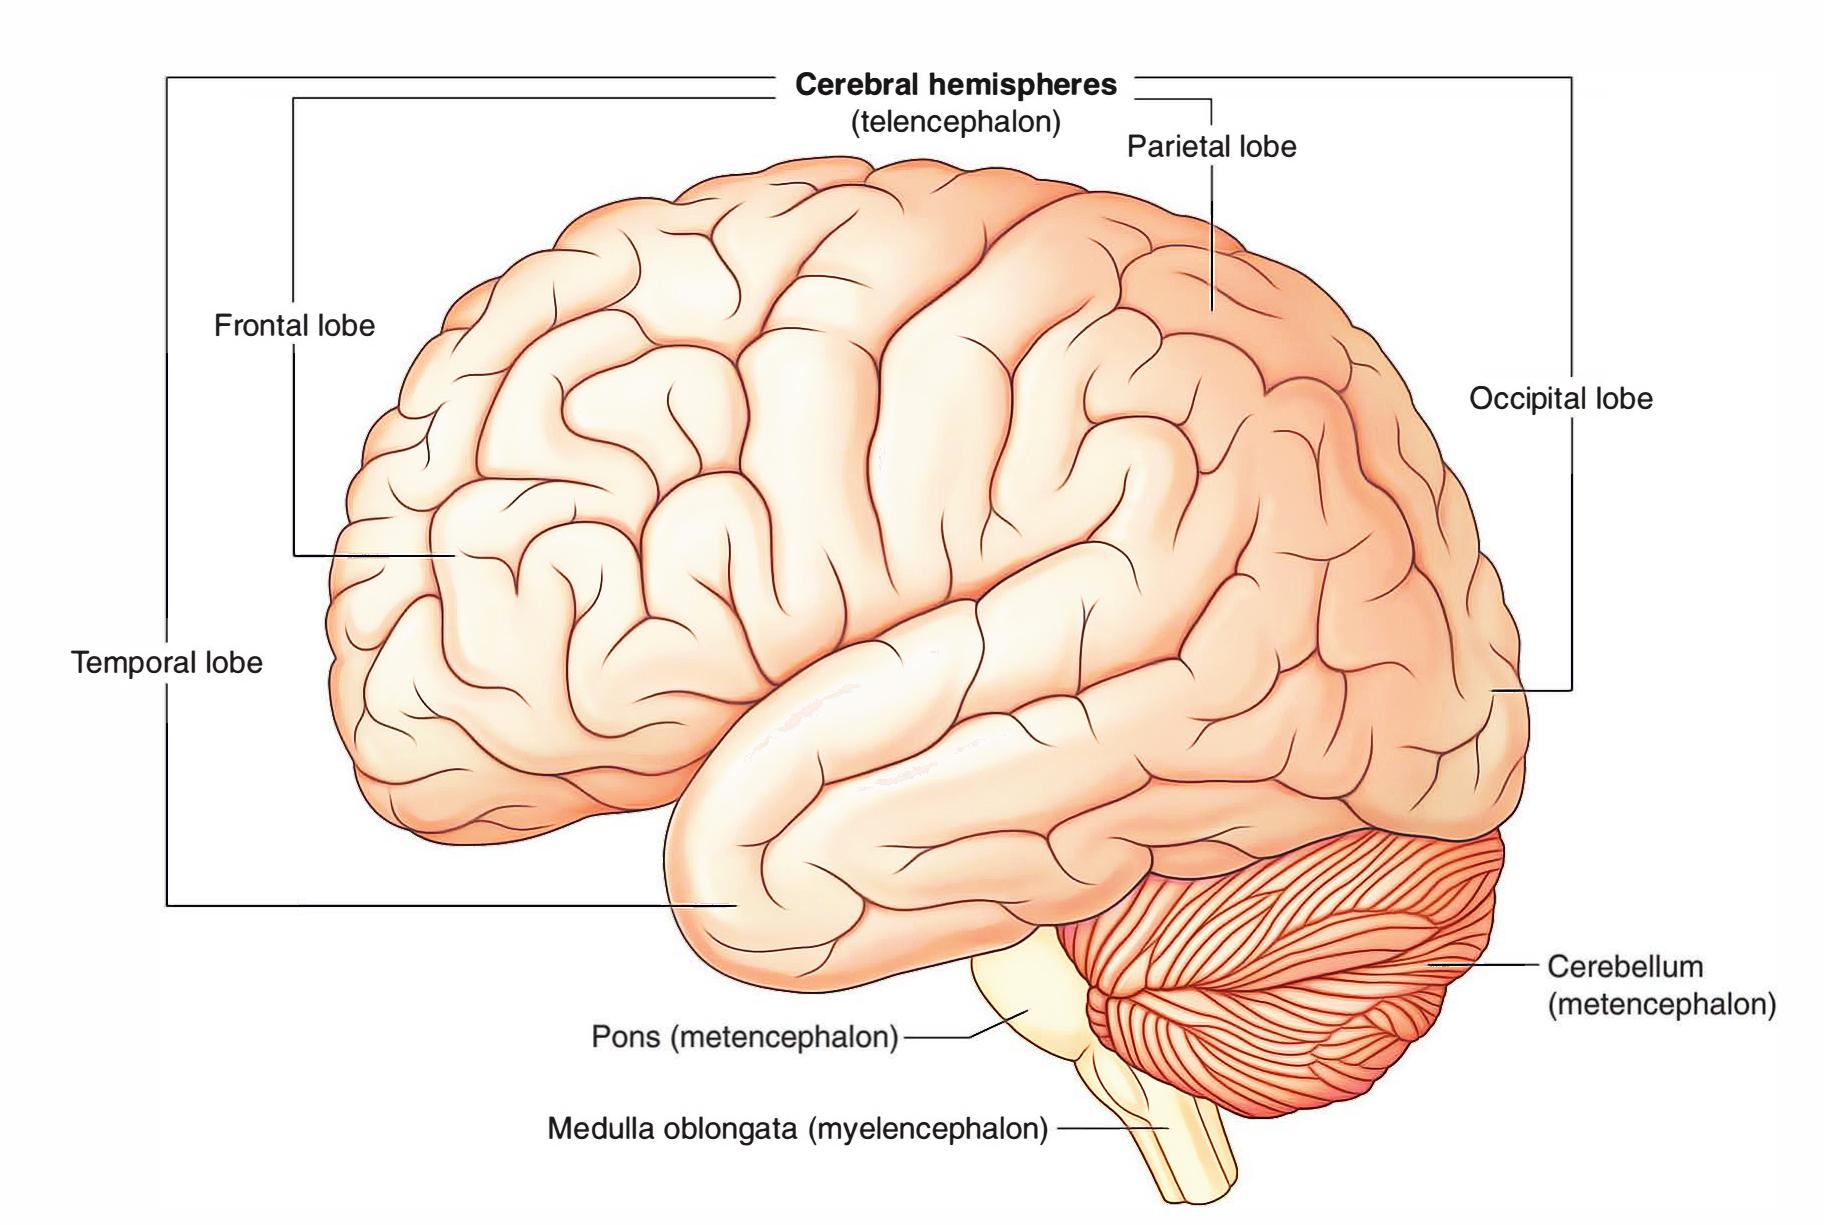 Parietal-lobe